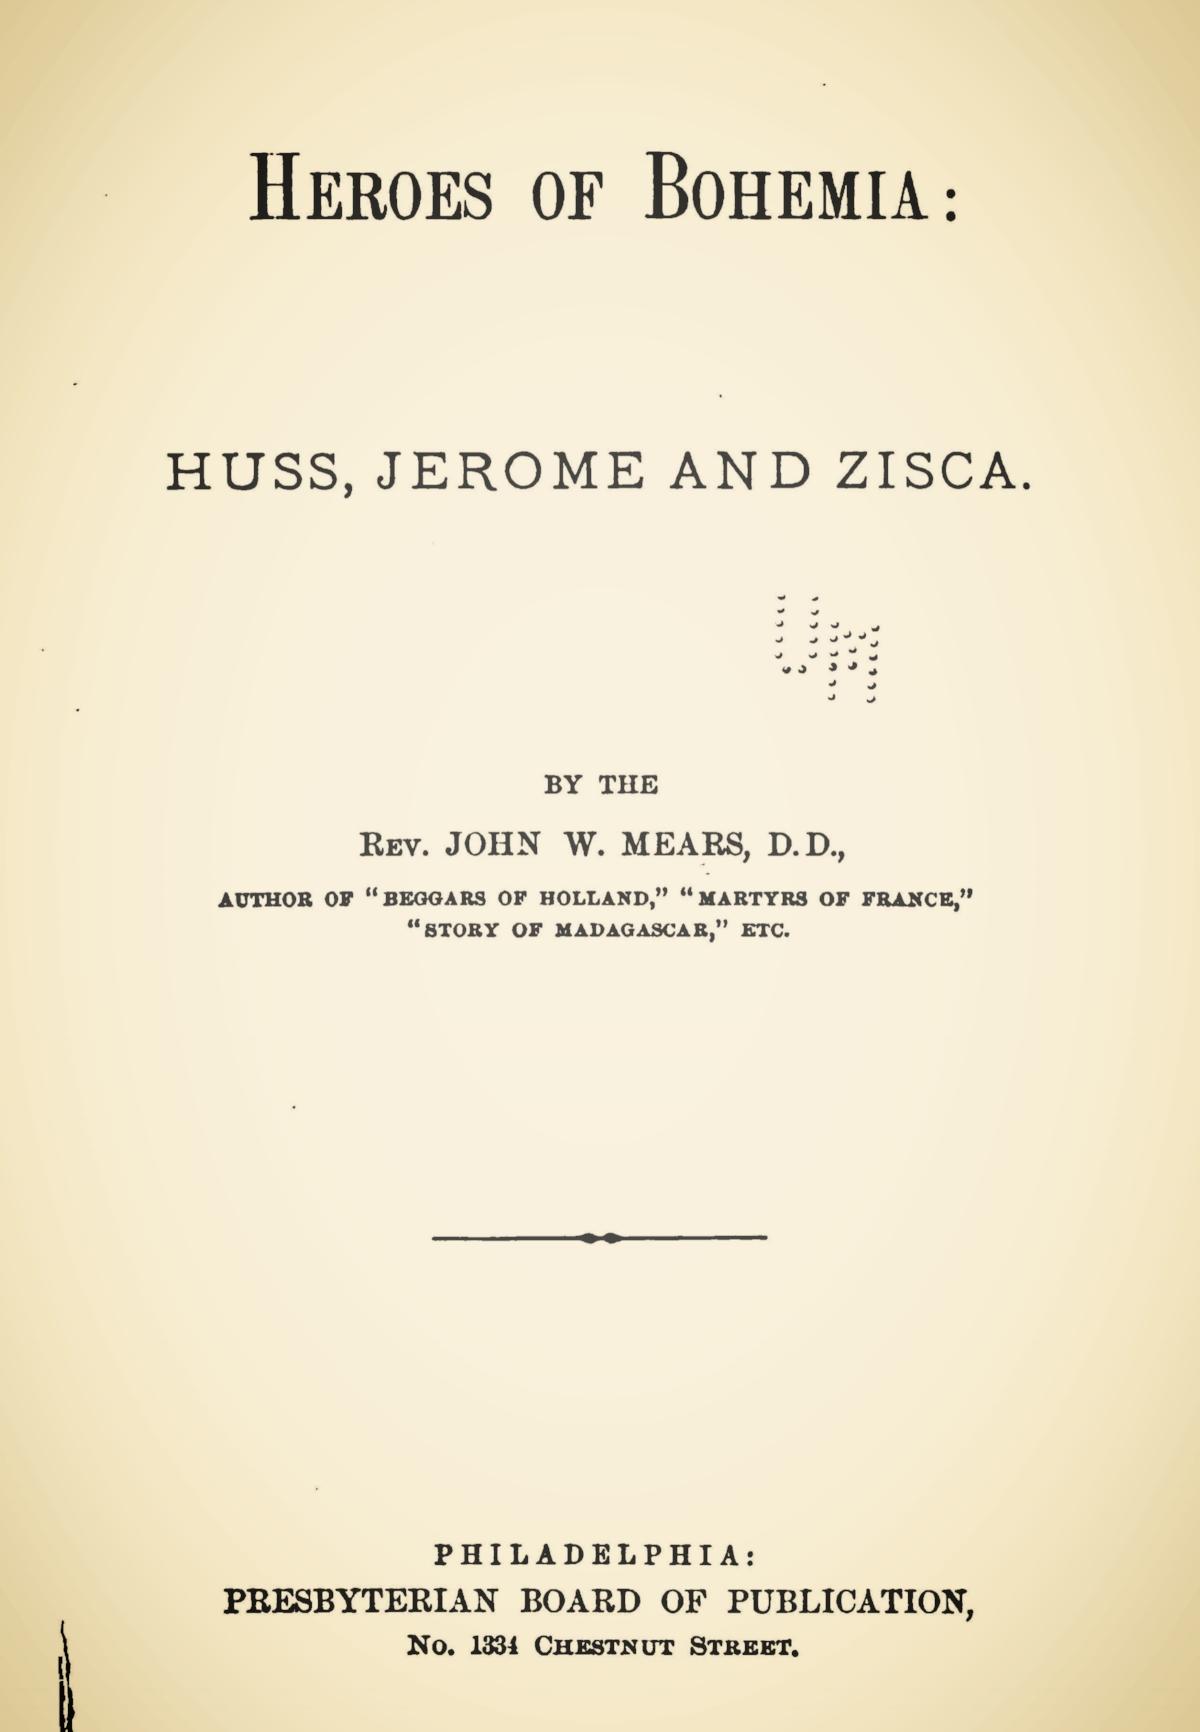 Mears, John William, Heroes of Bohemia Title Page.jpg